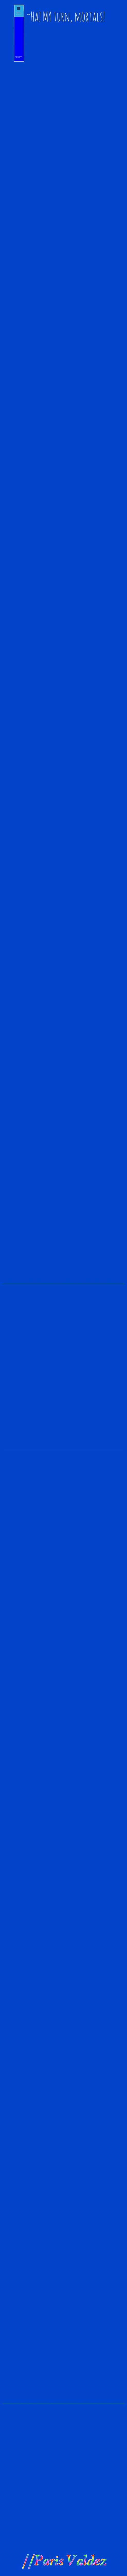 best bleu images on pinterest color blue shades of blue and